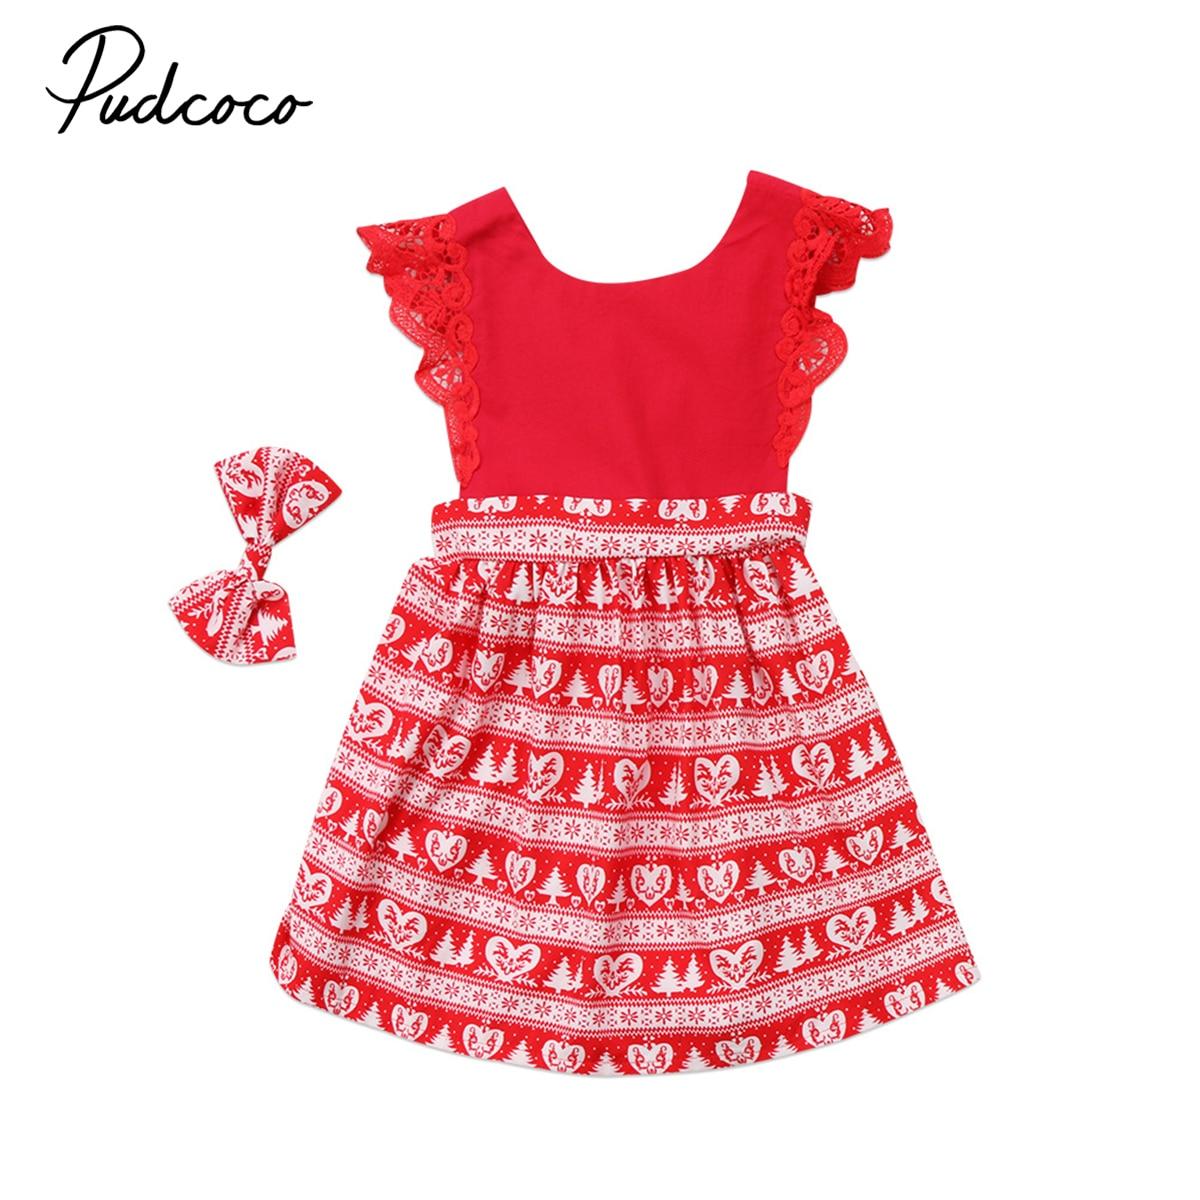 Helen115 Christmas Kids baby girl clothes Lace Sleeveless Bodysuit Dresses+Headband 0-24M 1-6Years